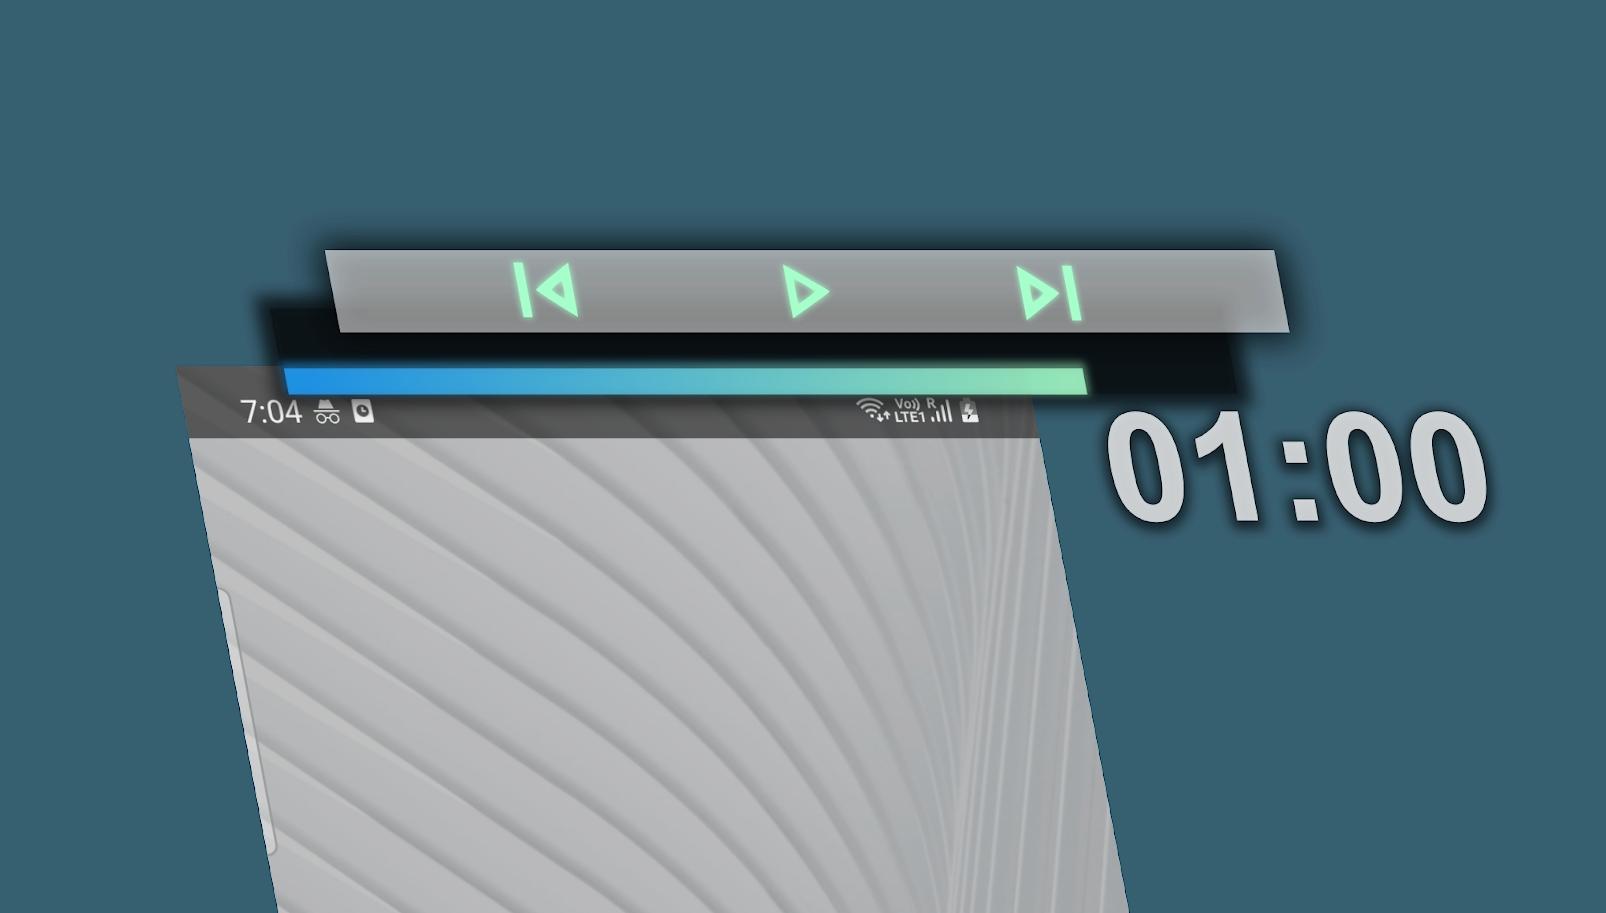 [APK] Media Bar:在安卓状态栏上控制音视频播放